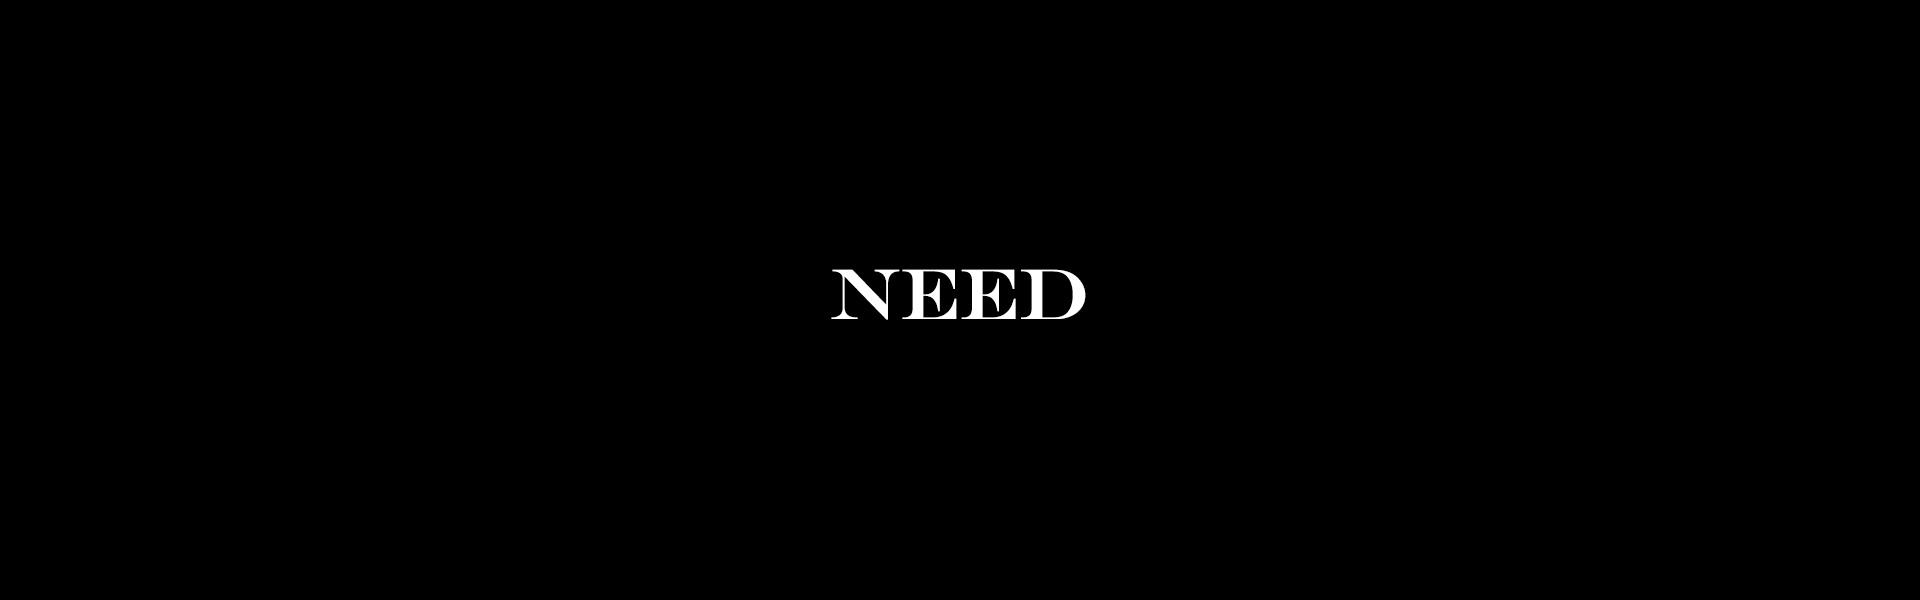 https://mixing.studio11chicago.com/wp-content/uploads/2014/02/NEED.jpg